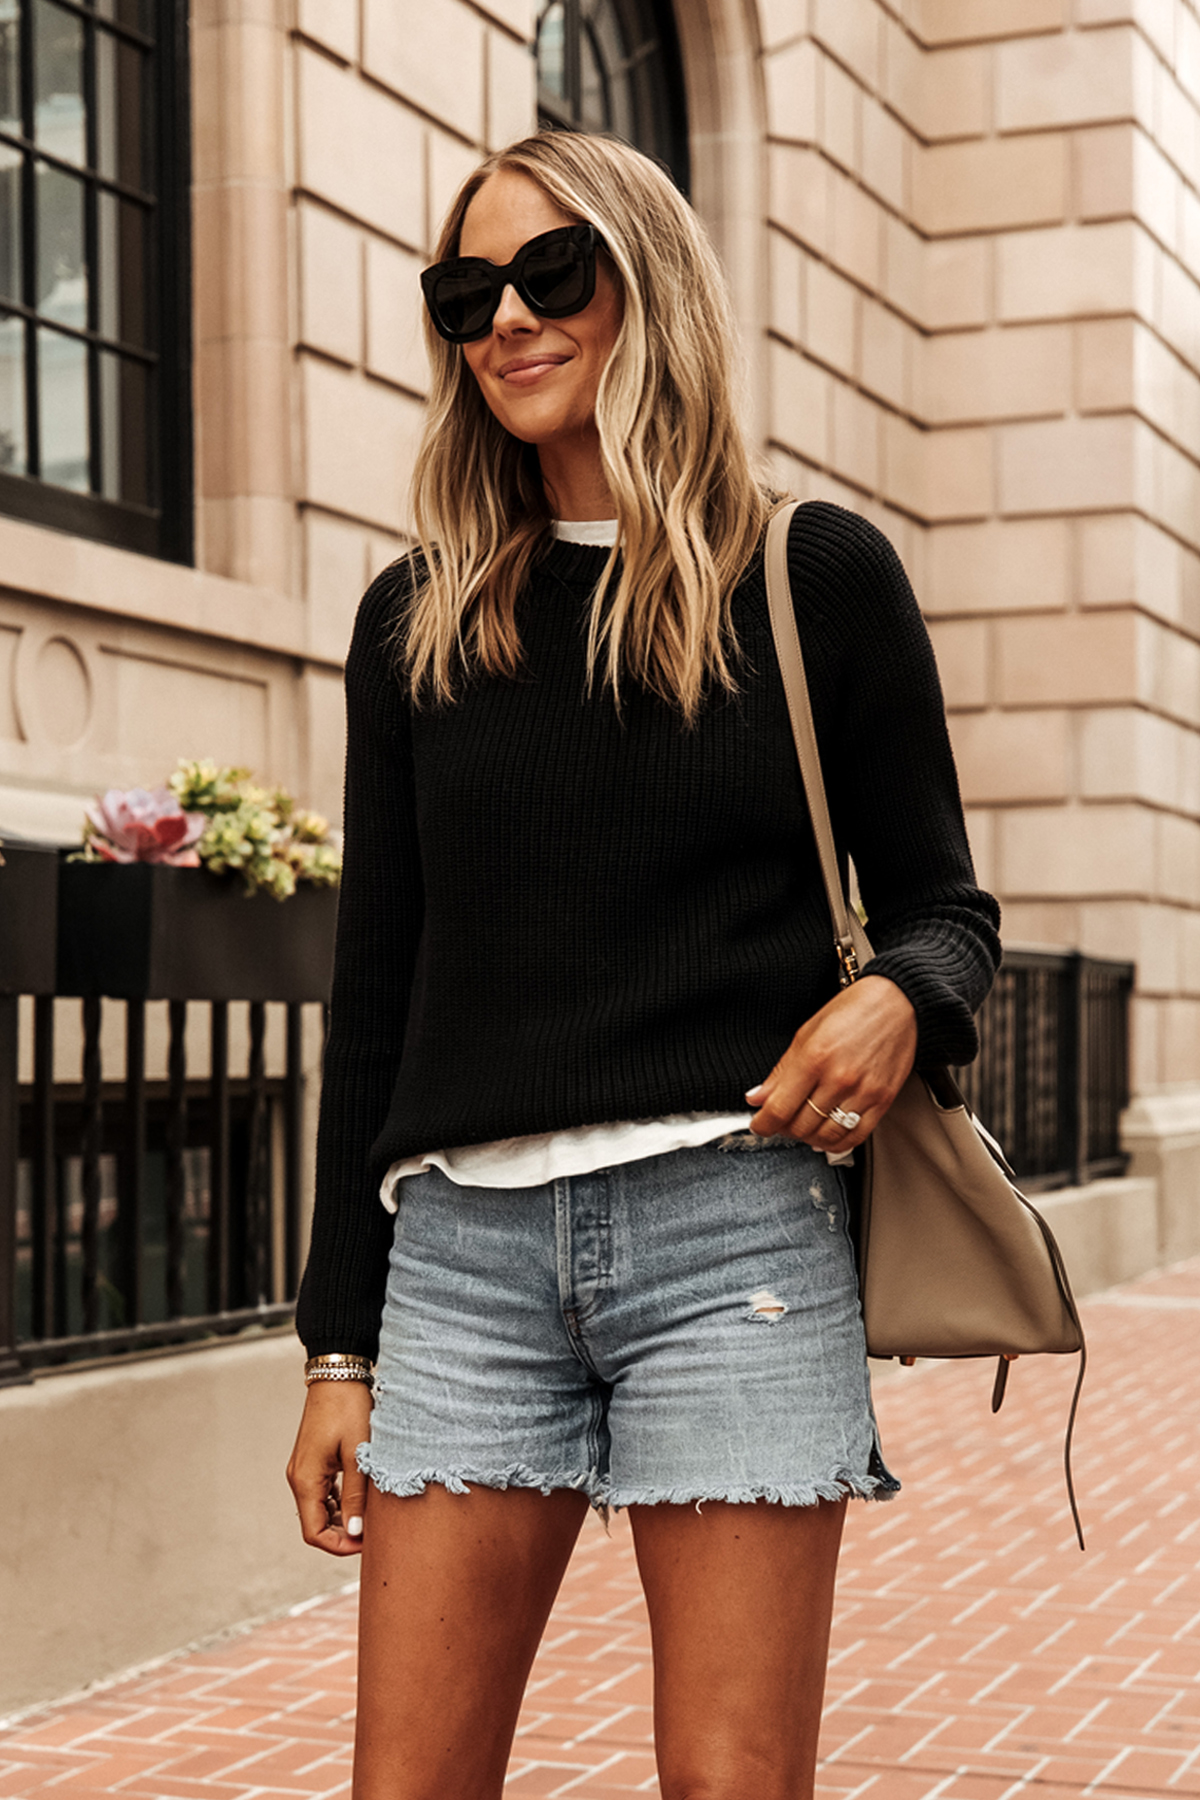 Fashion Jackson Wearing Jenni Kayne Black Fisherman Sweater White Tshirt Denim Shorts 1